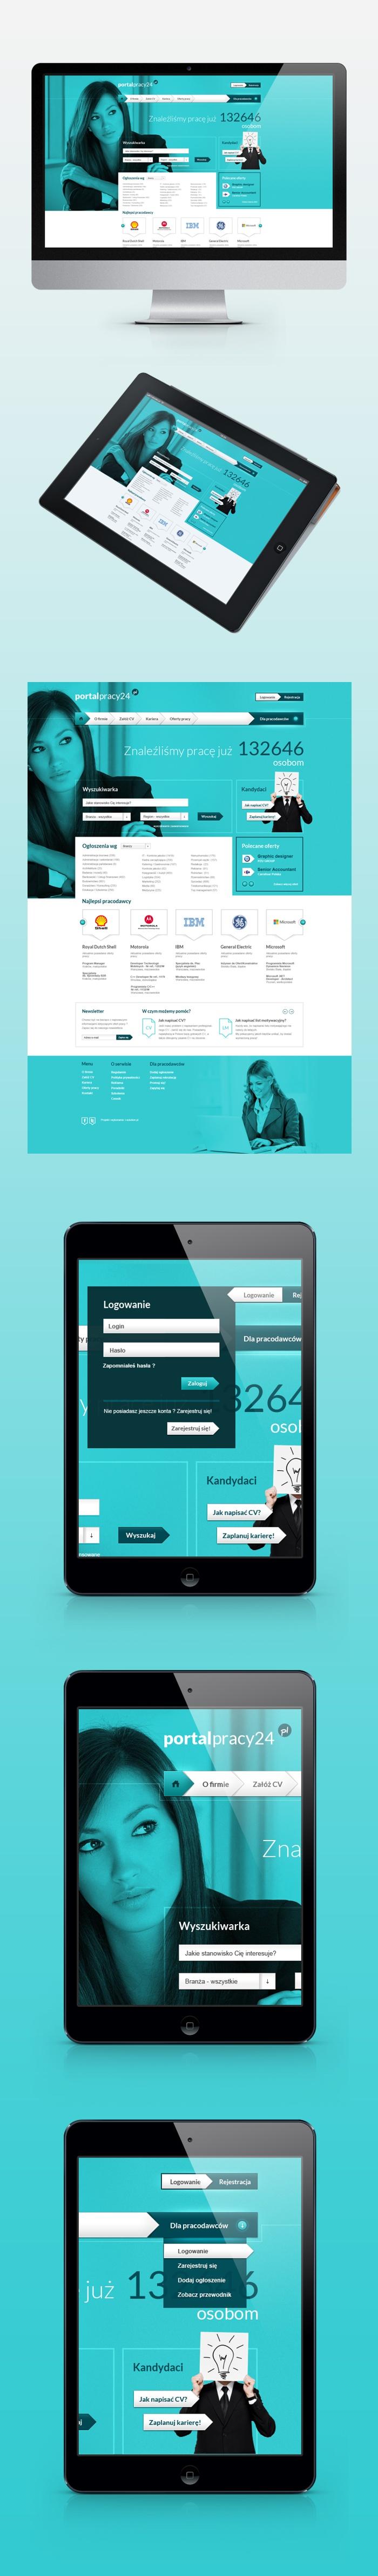 best ideas about job portal website layout food portalpracy24 pl job portal by adam rozmus via behance